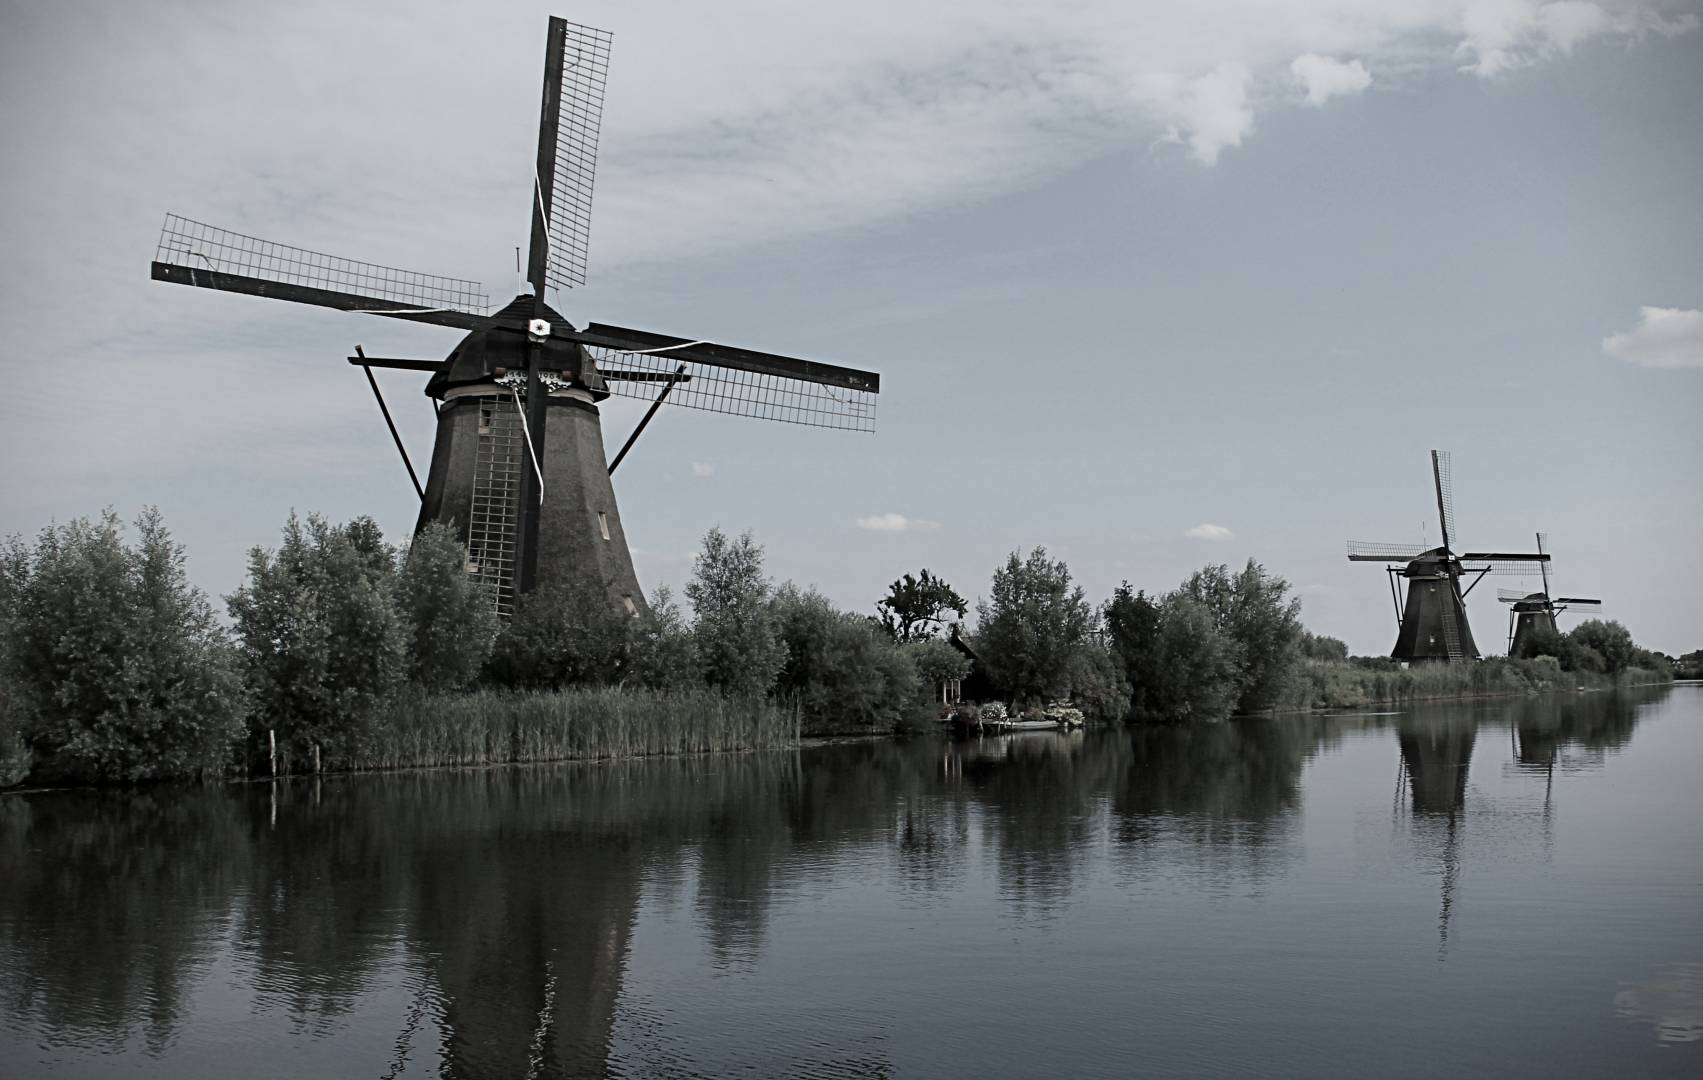 Holland Trip Photo Diary: Day 11 - Kinderdijk